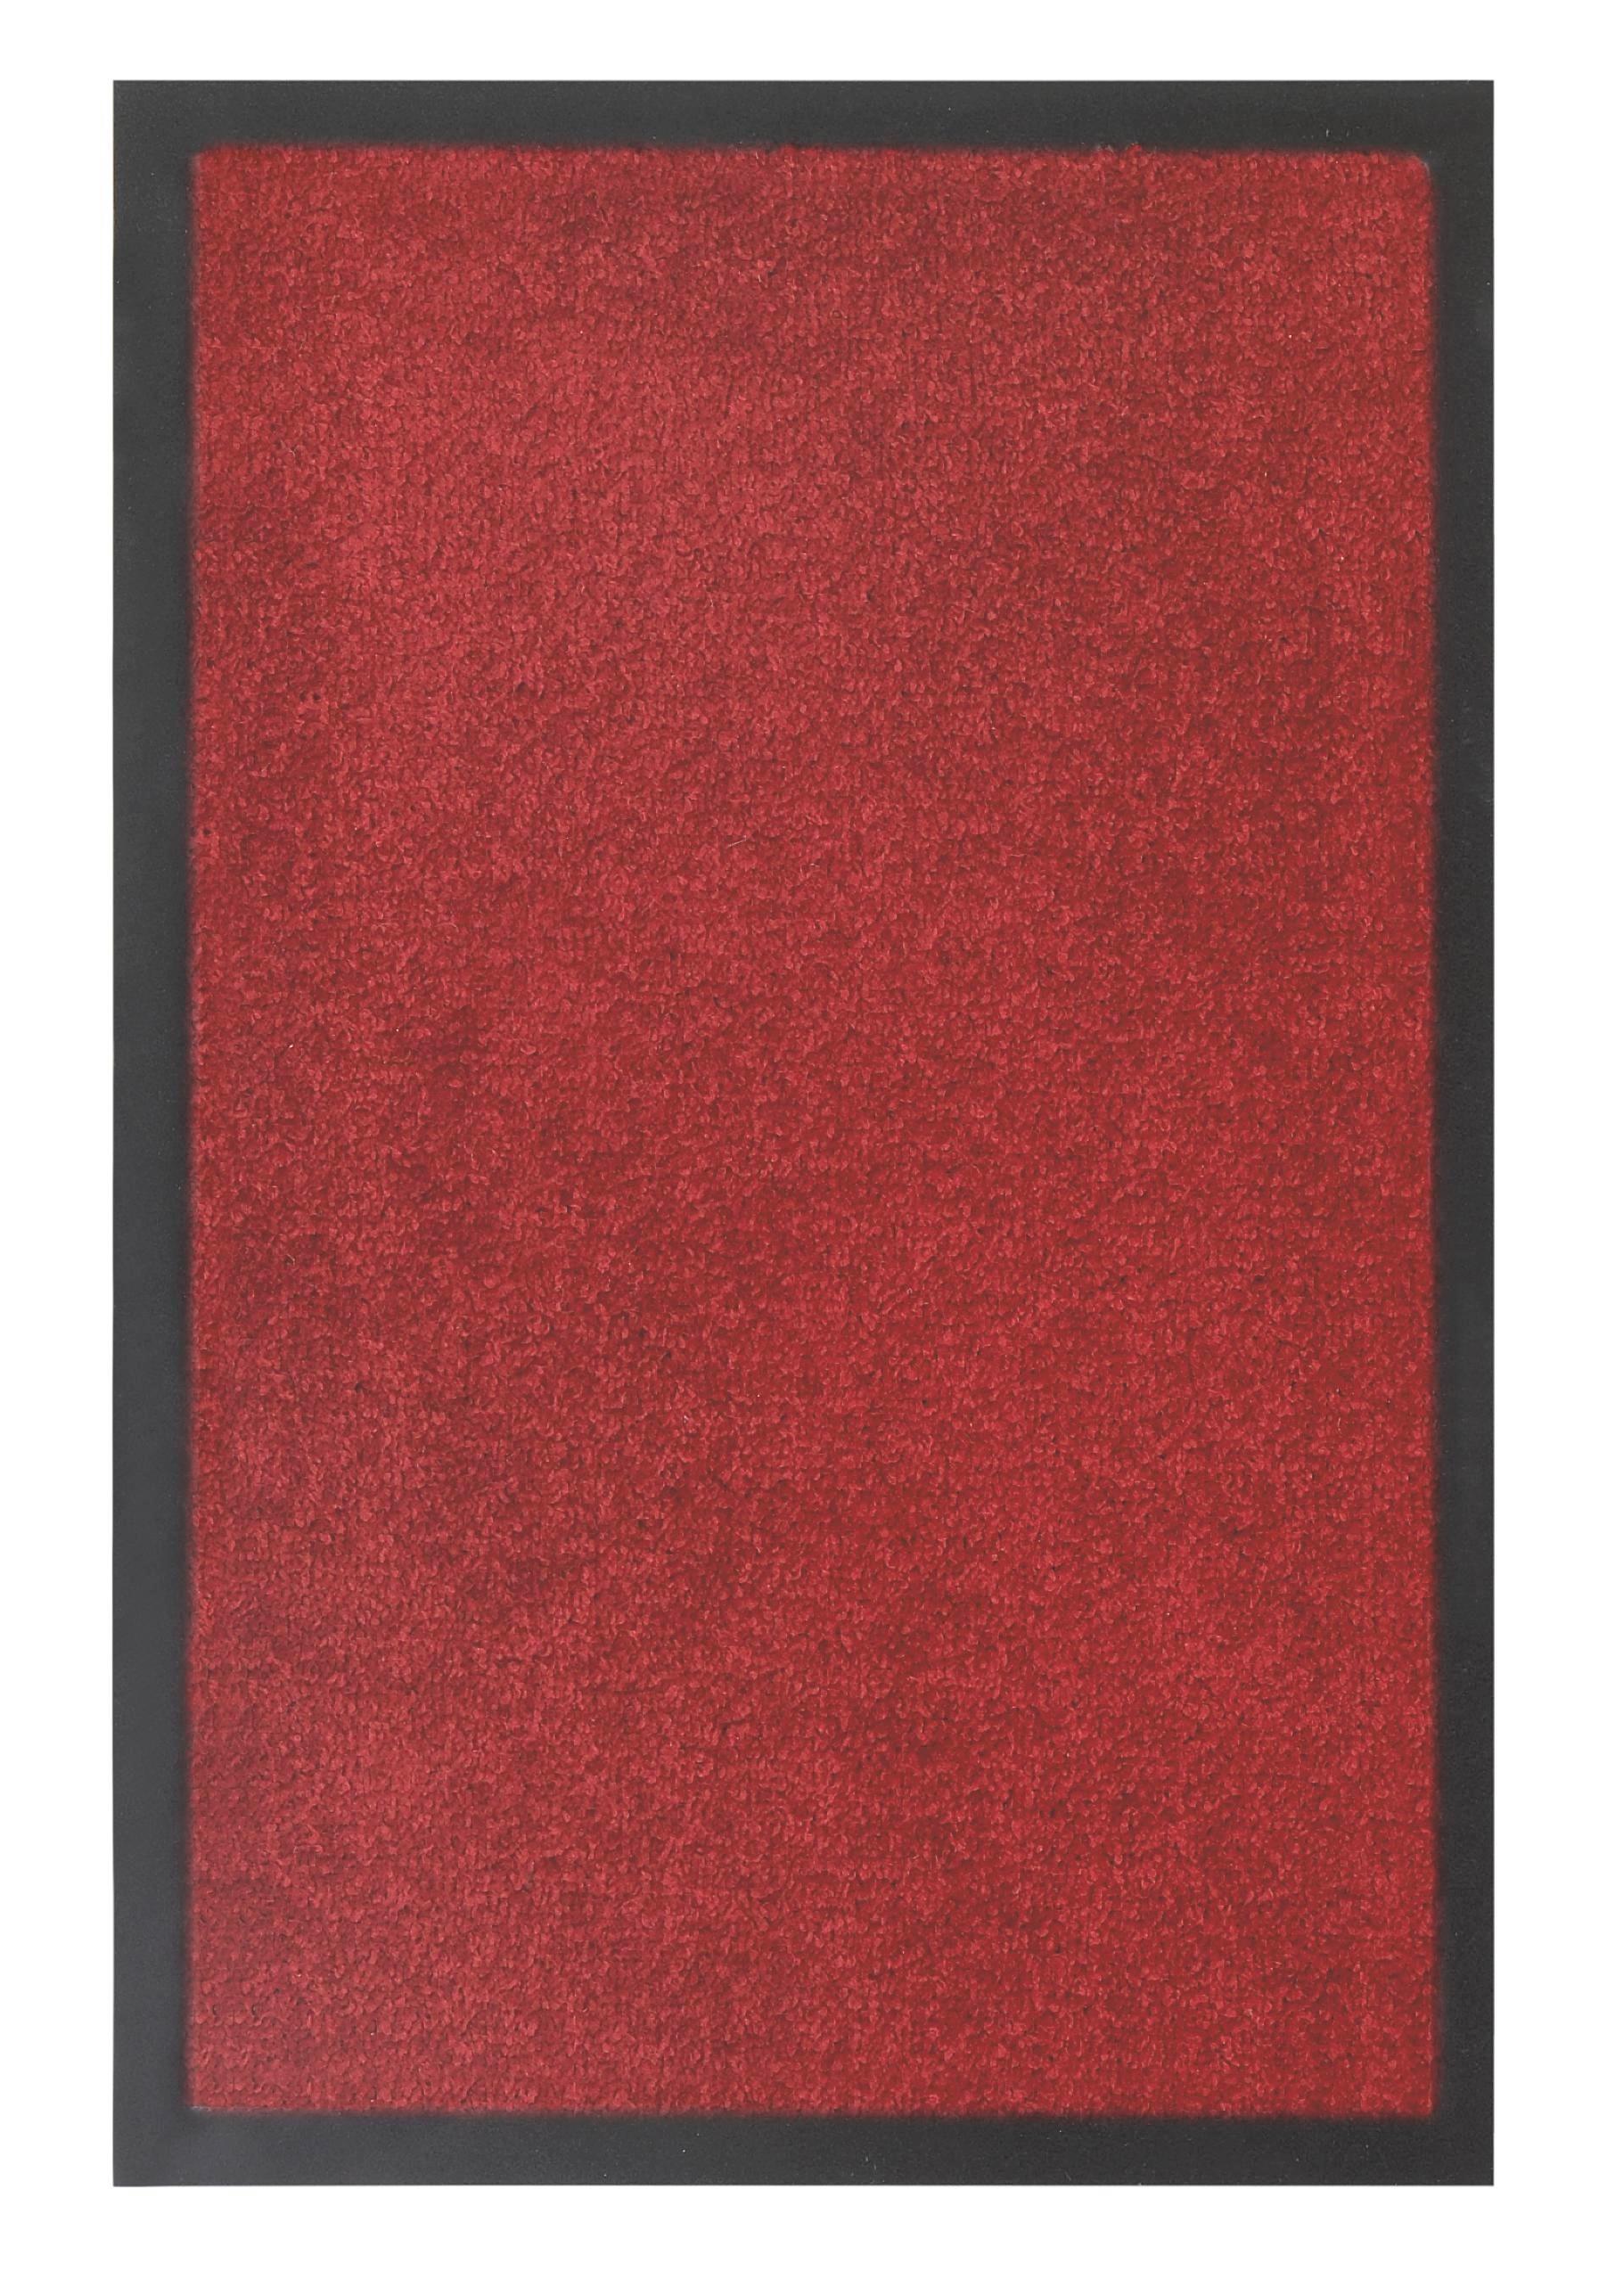 Fußmatte Eton in Rot, ca. 60x80cm - Rot, LIFESTYLE, Textil (60/80cm) - MÖMAX modern living